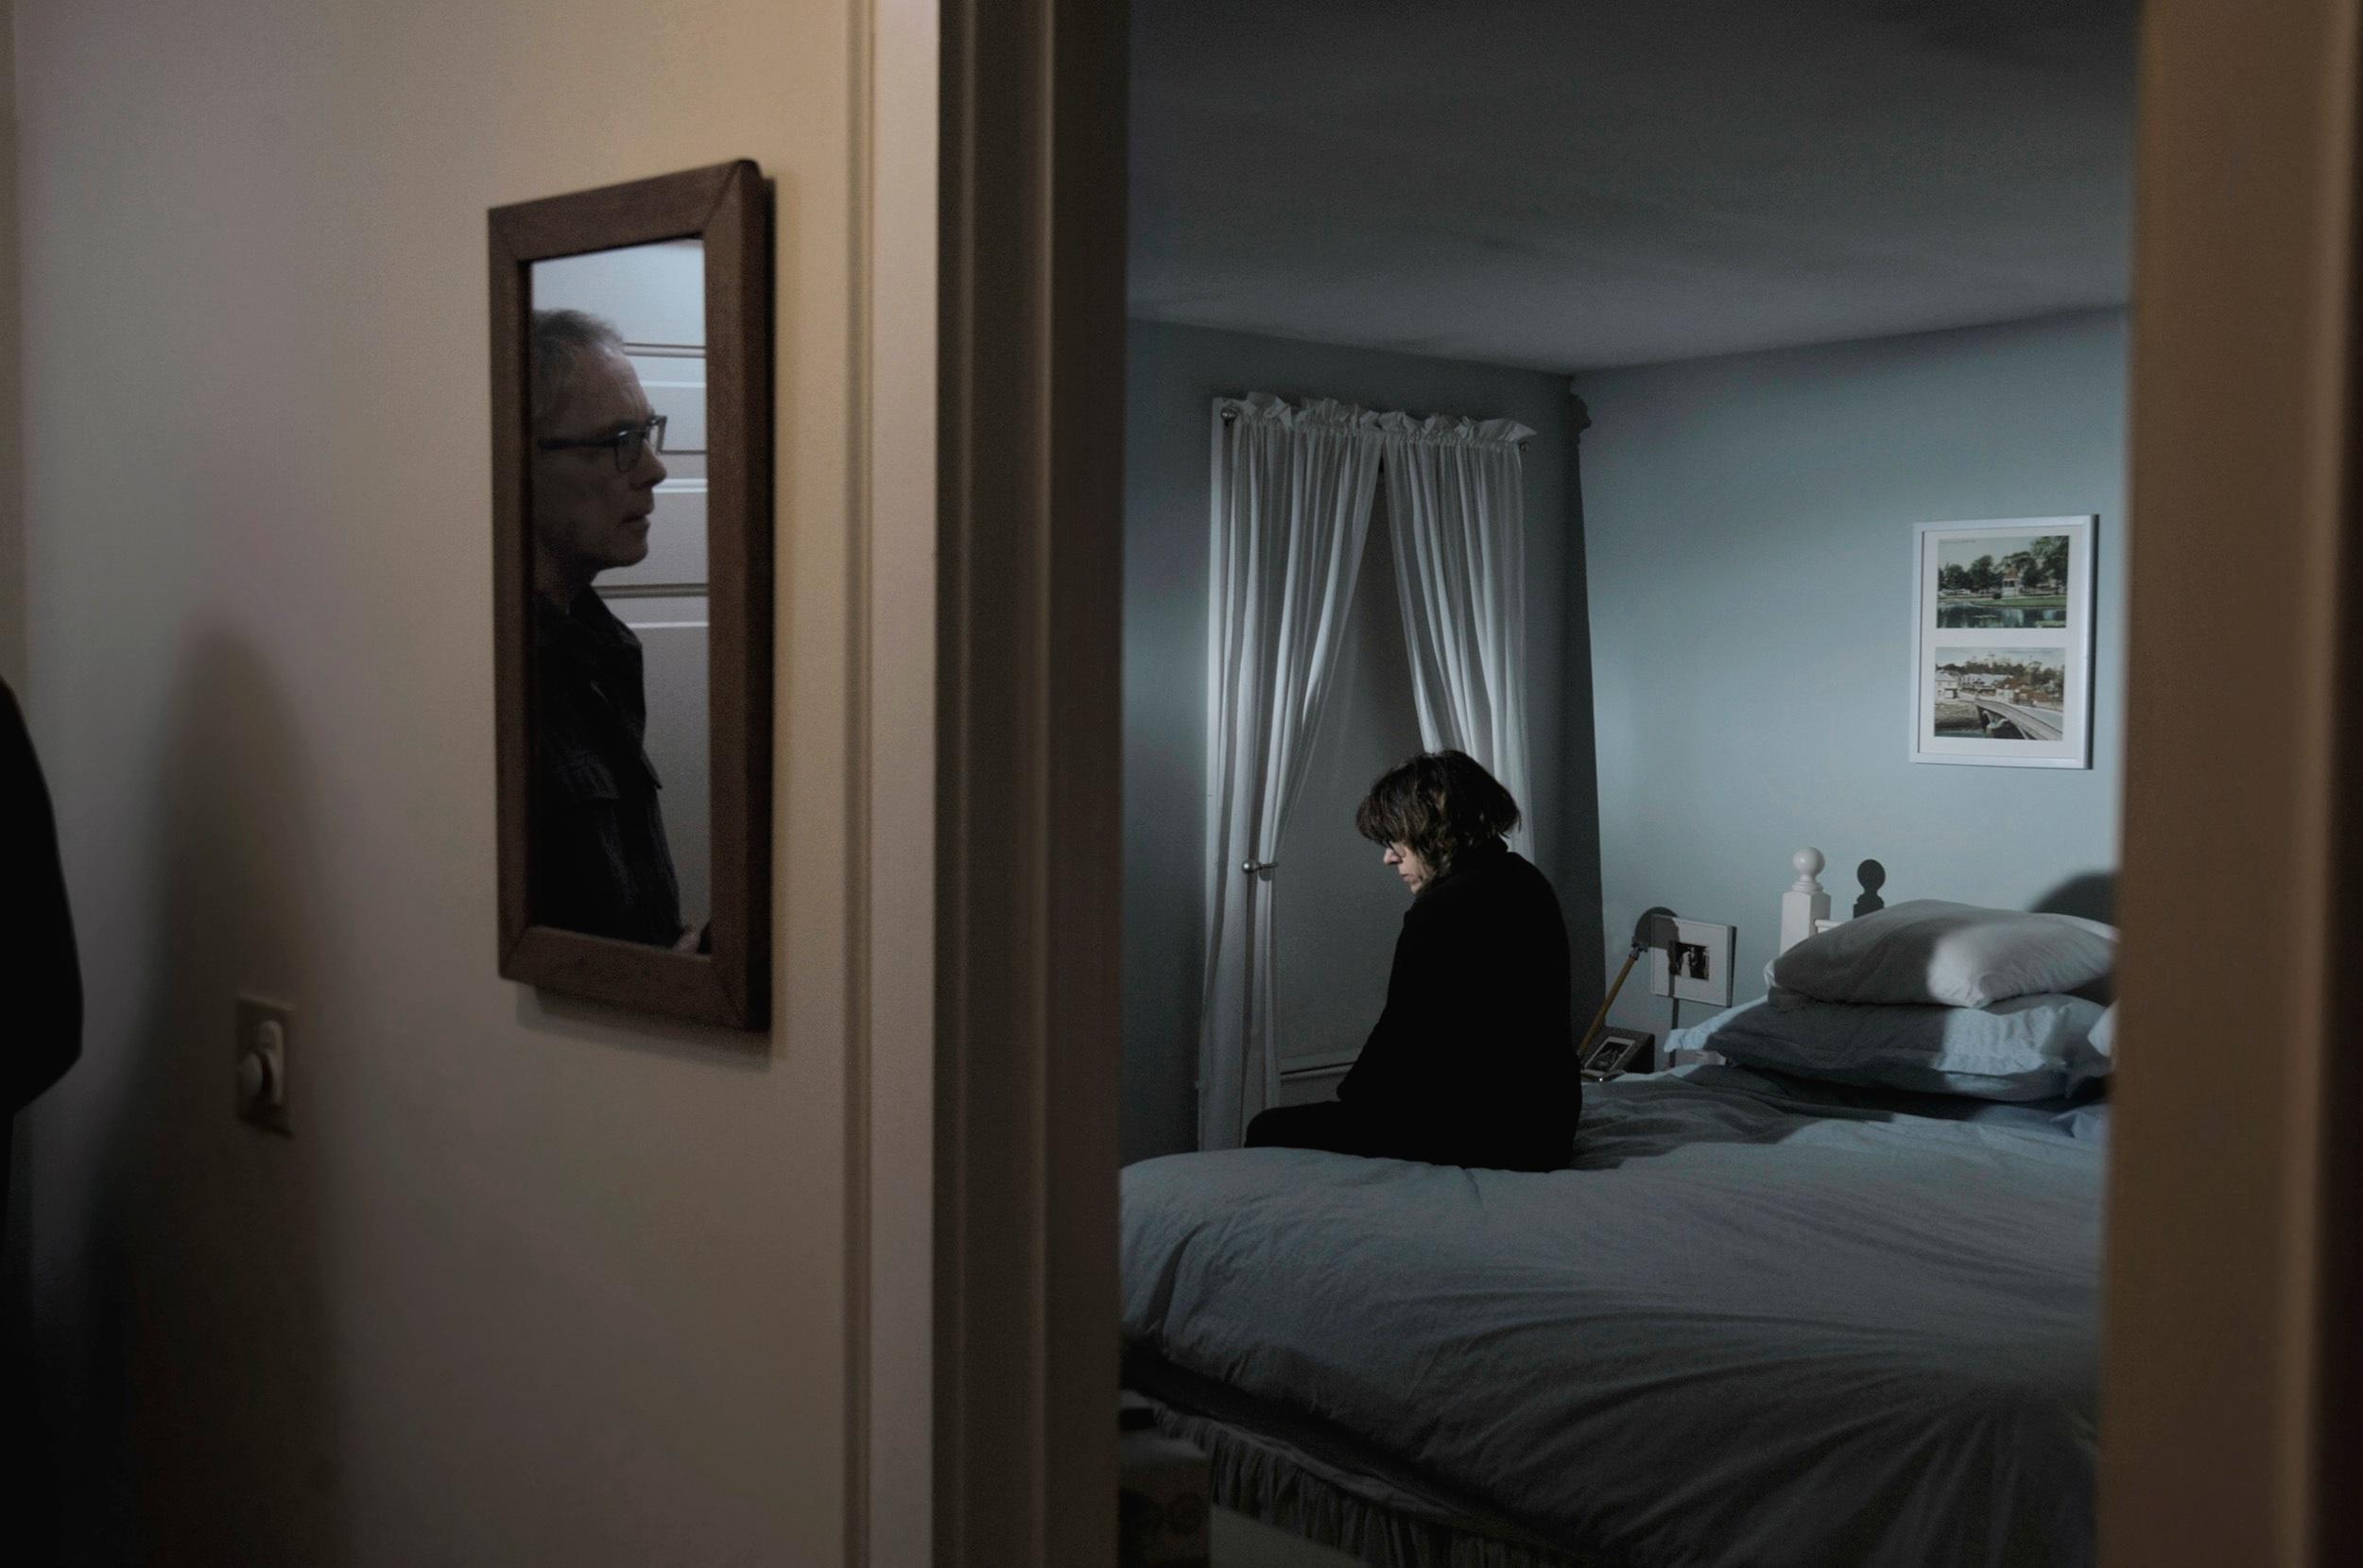 3self_w_diane_sitting_on_bed.jpg